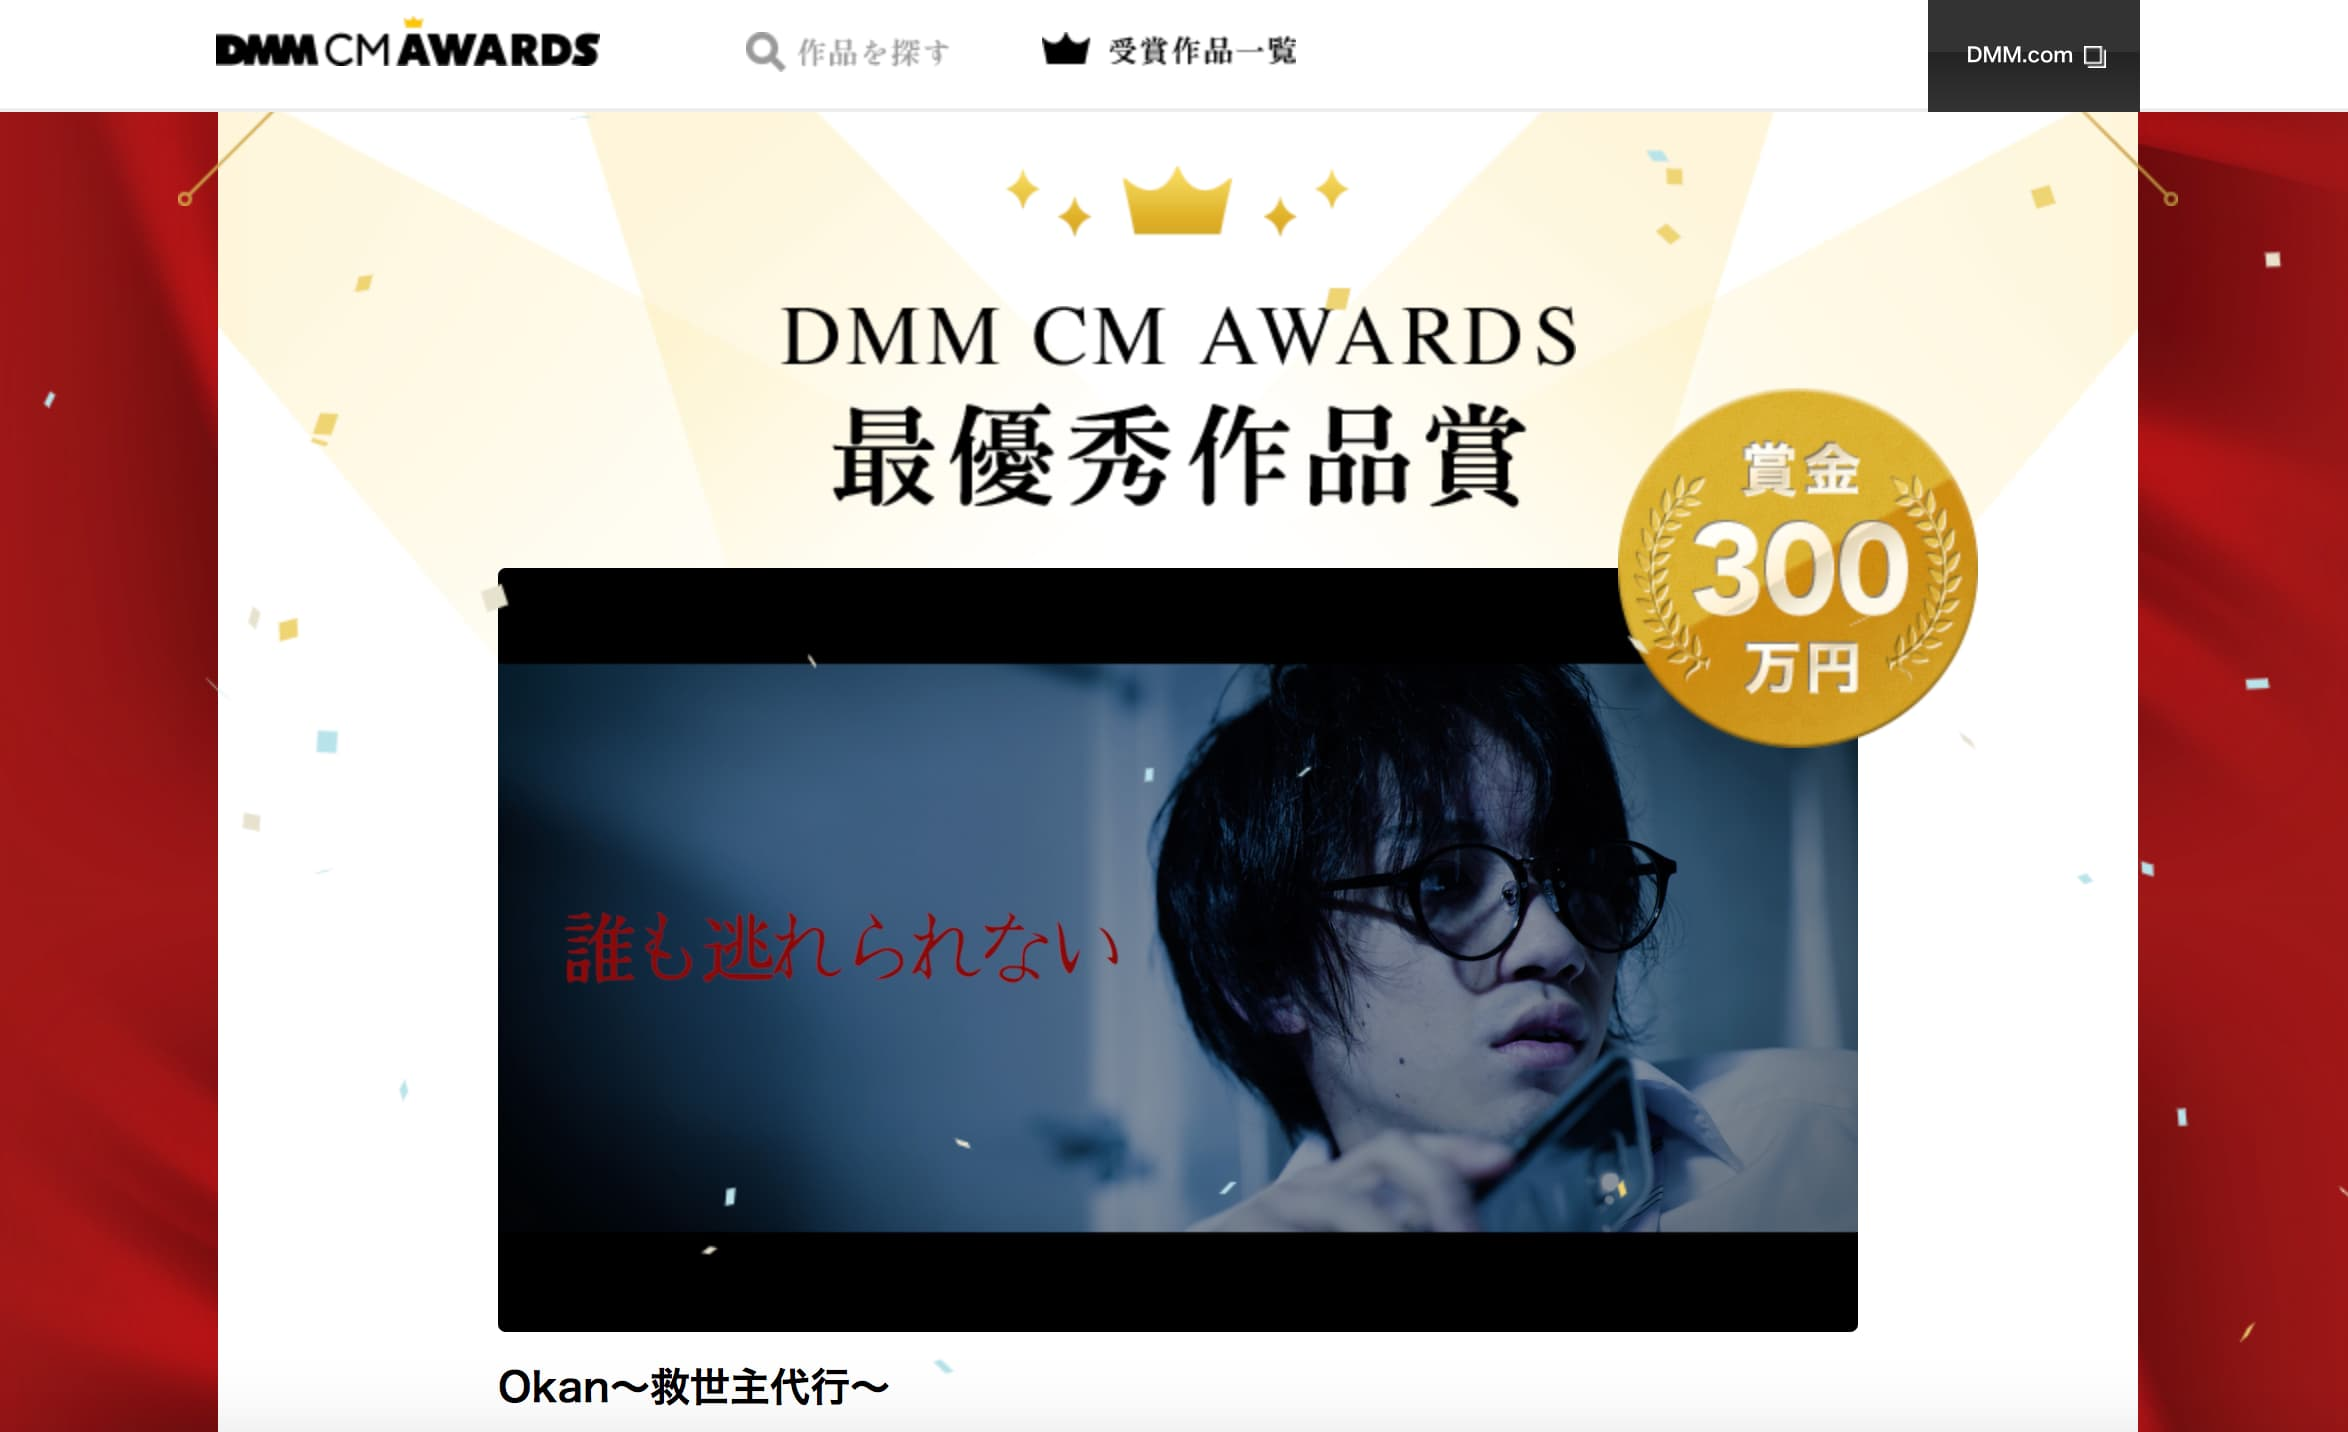 DMM CM AWARD